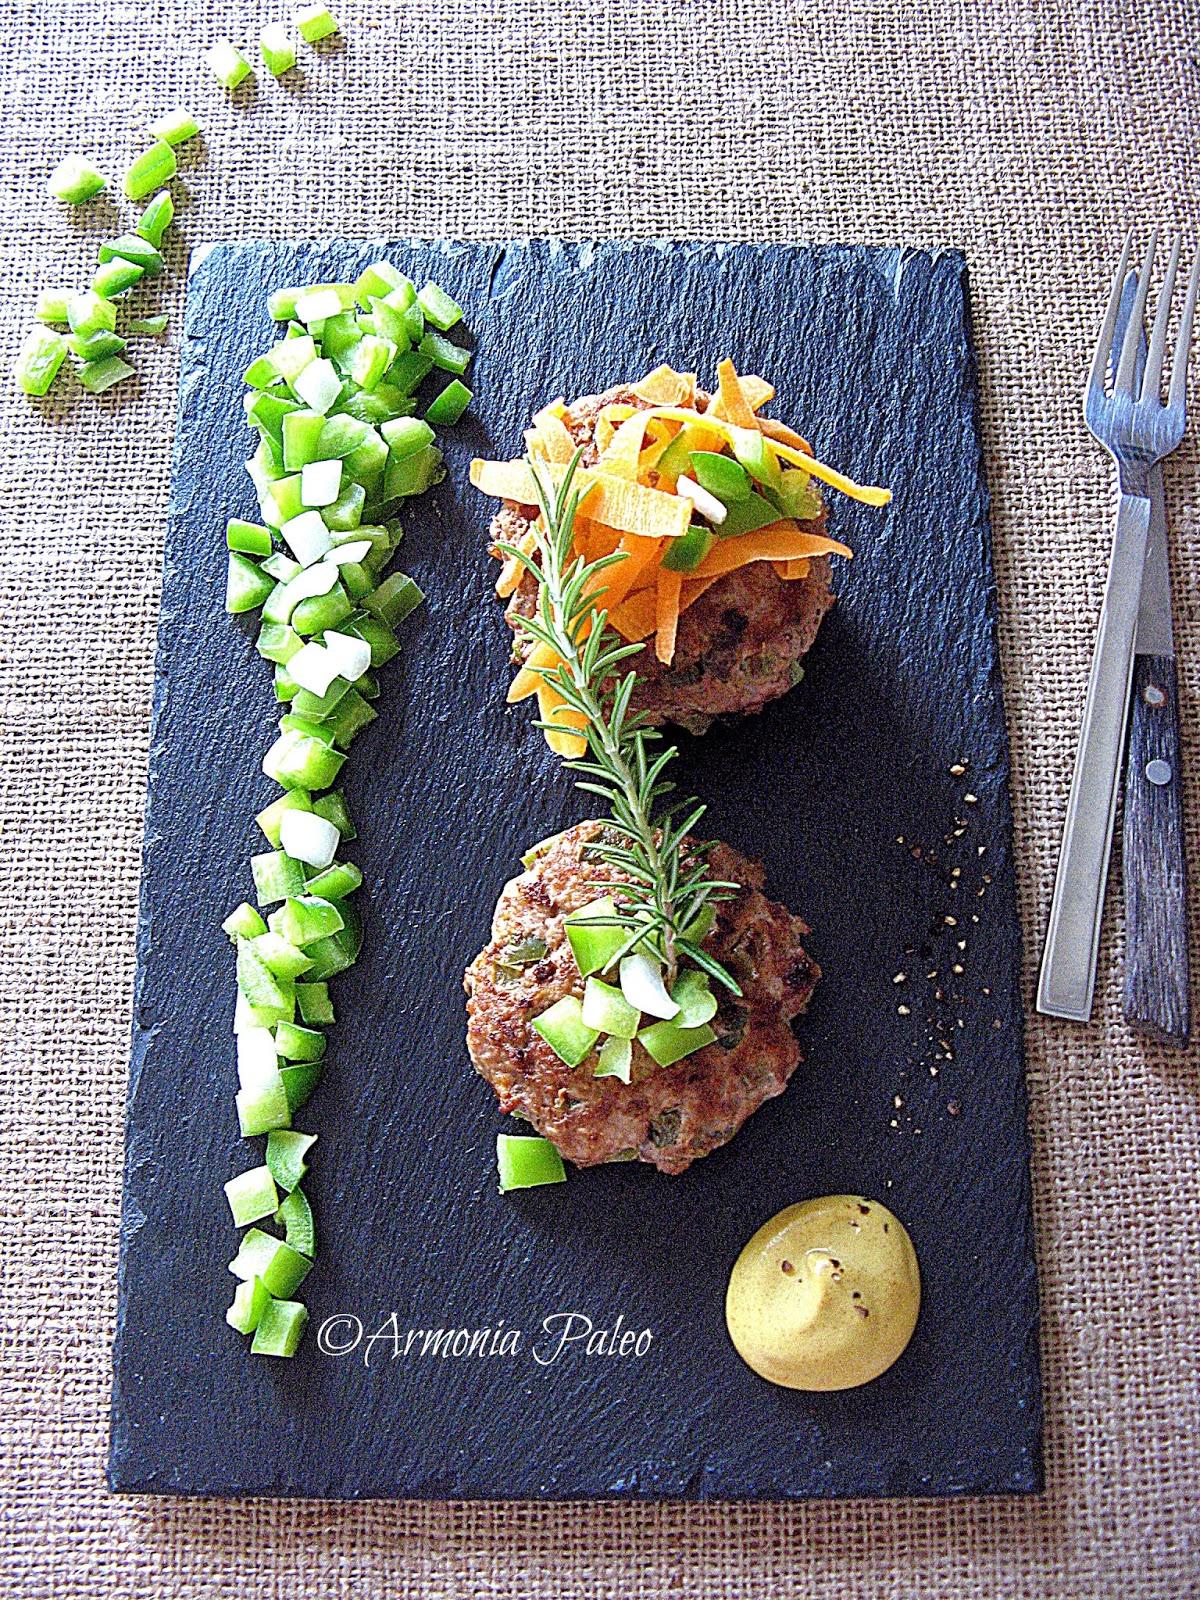 Hamburger di Carne e Peperoni di Armonia Paleo